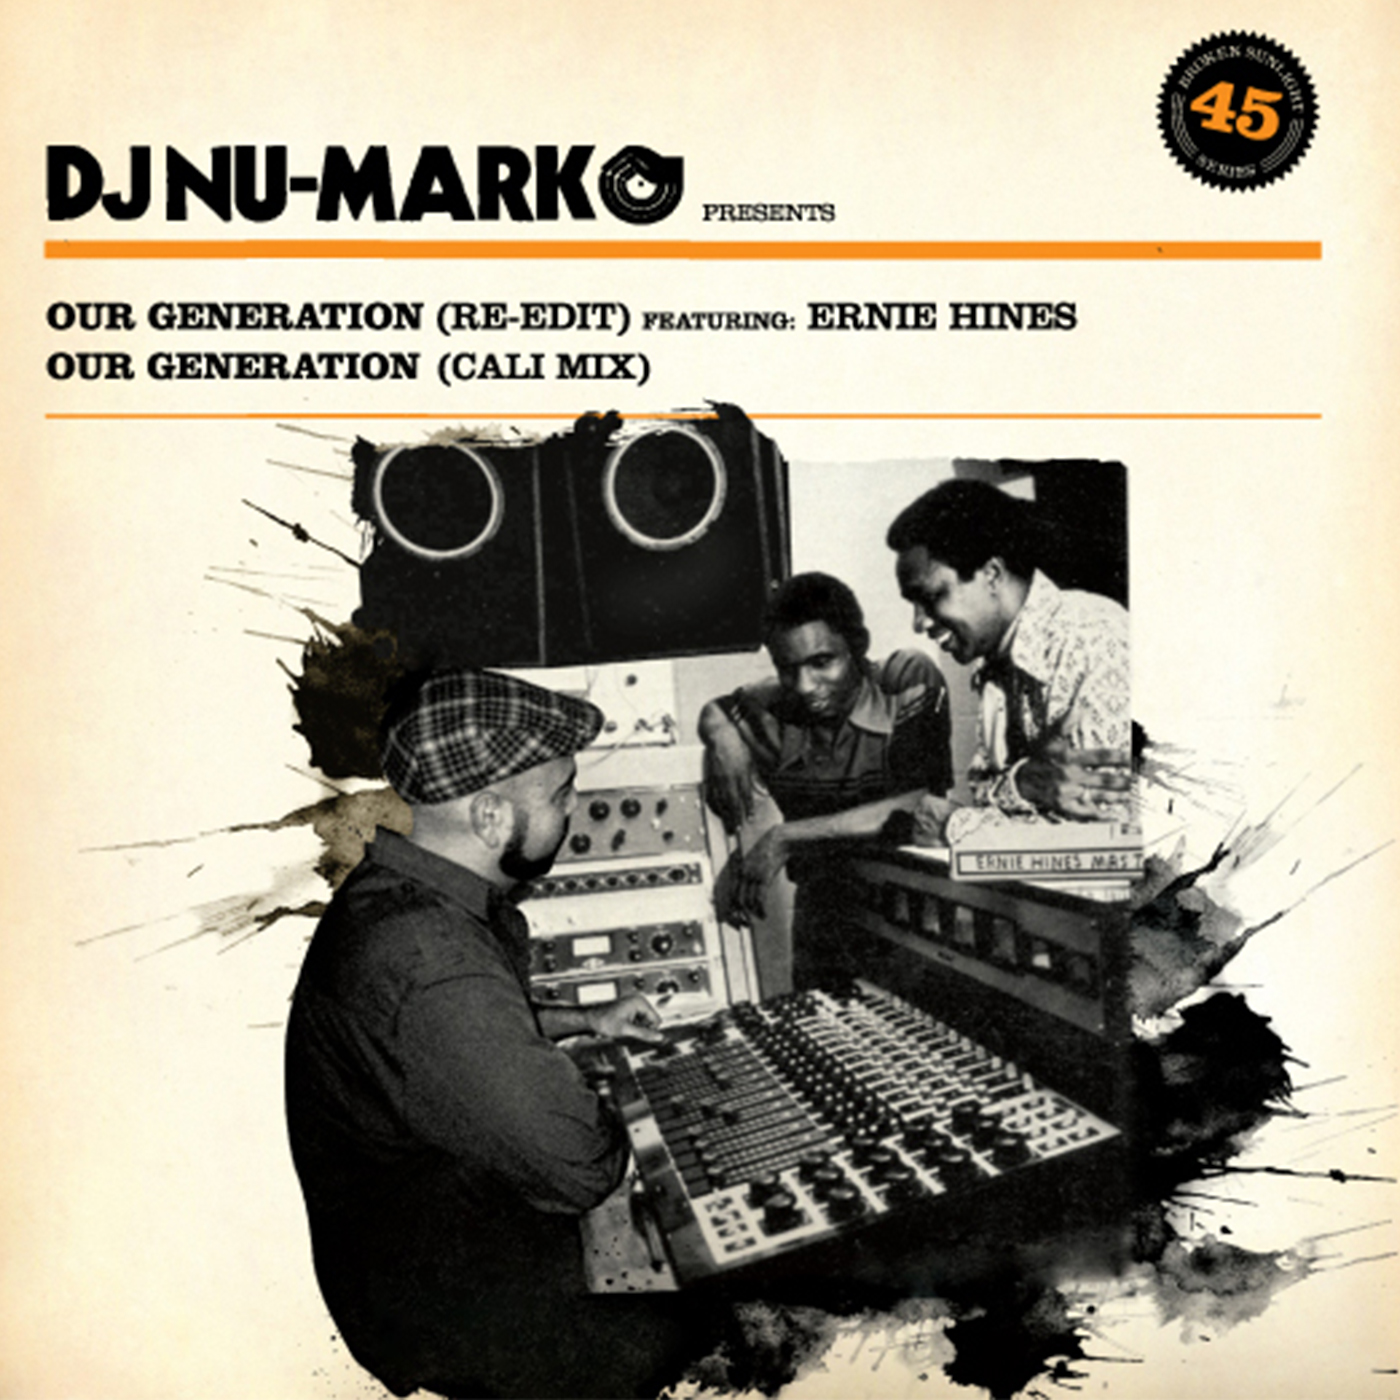 DJ Nu-Mark - Our Generation (Cali Mix)